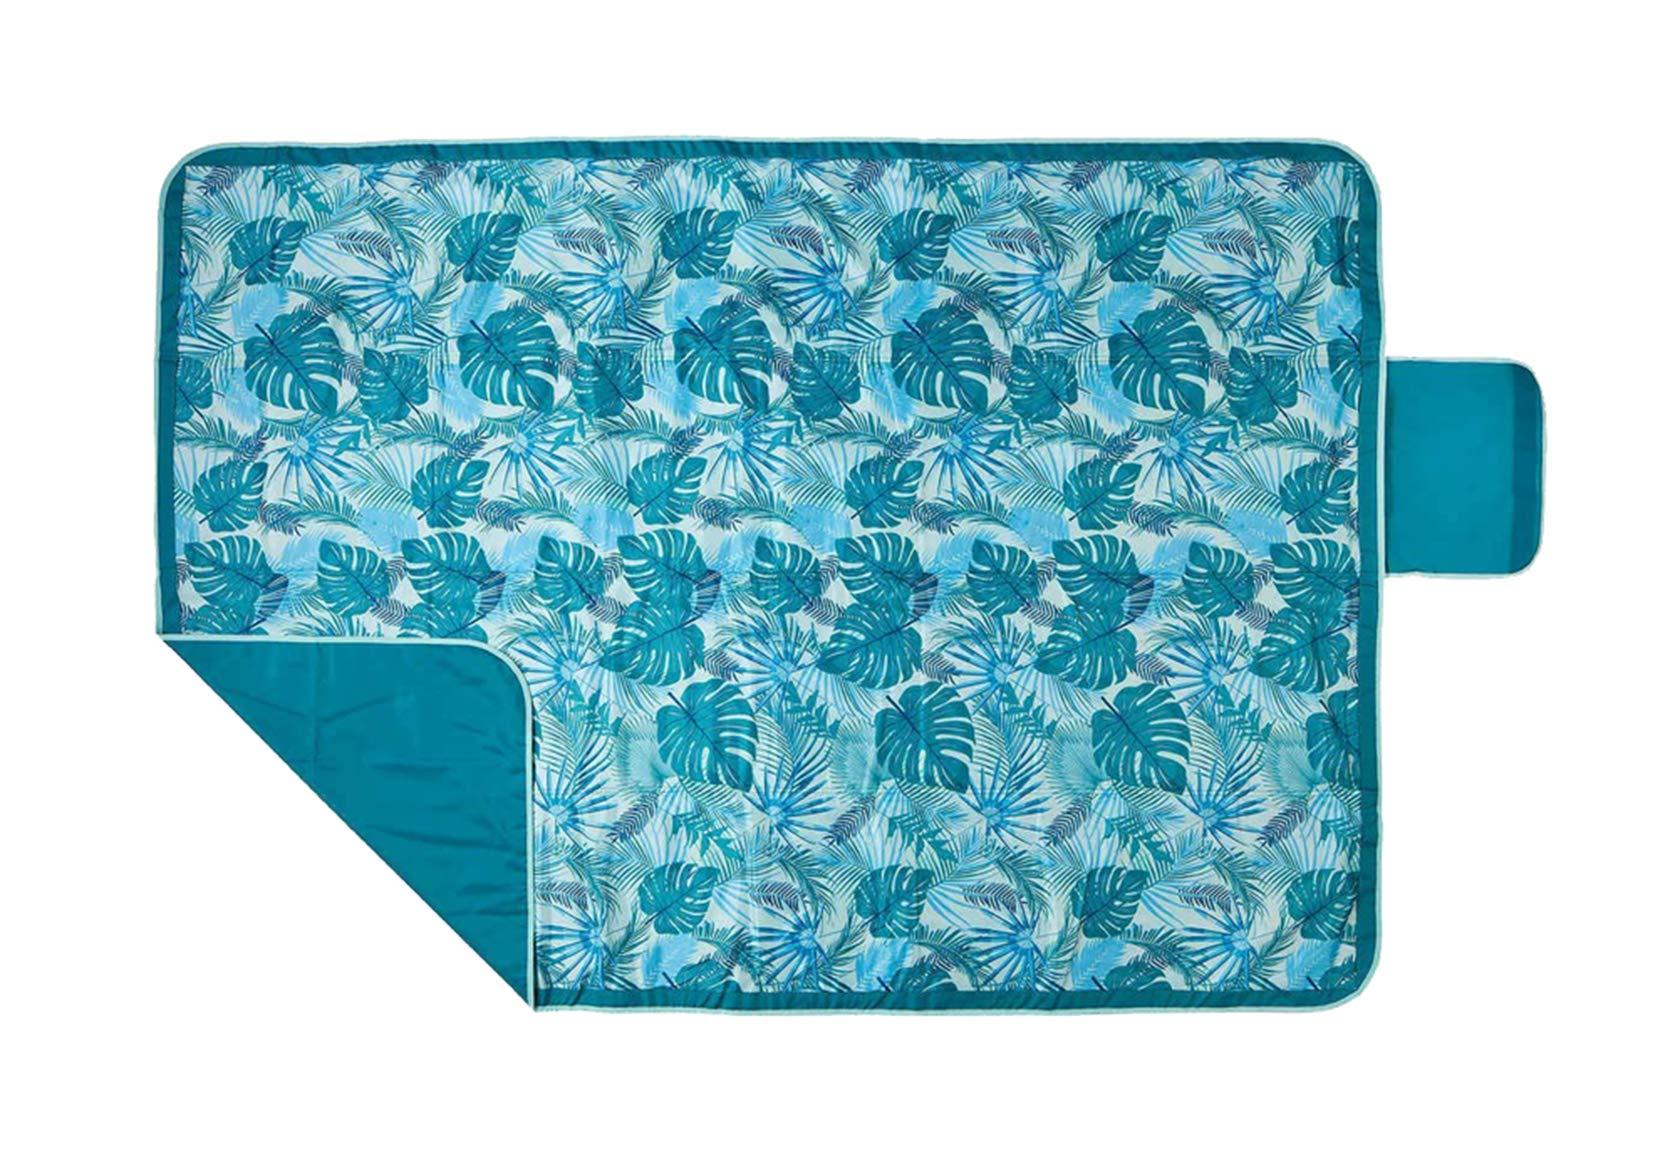 Lightspeed Outdoors Waterproof Folding Outdoor Blanket (Large, Palm Green) by Lightspeed Outdoors